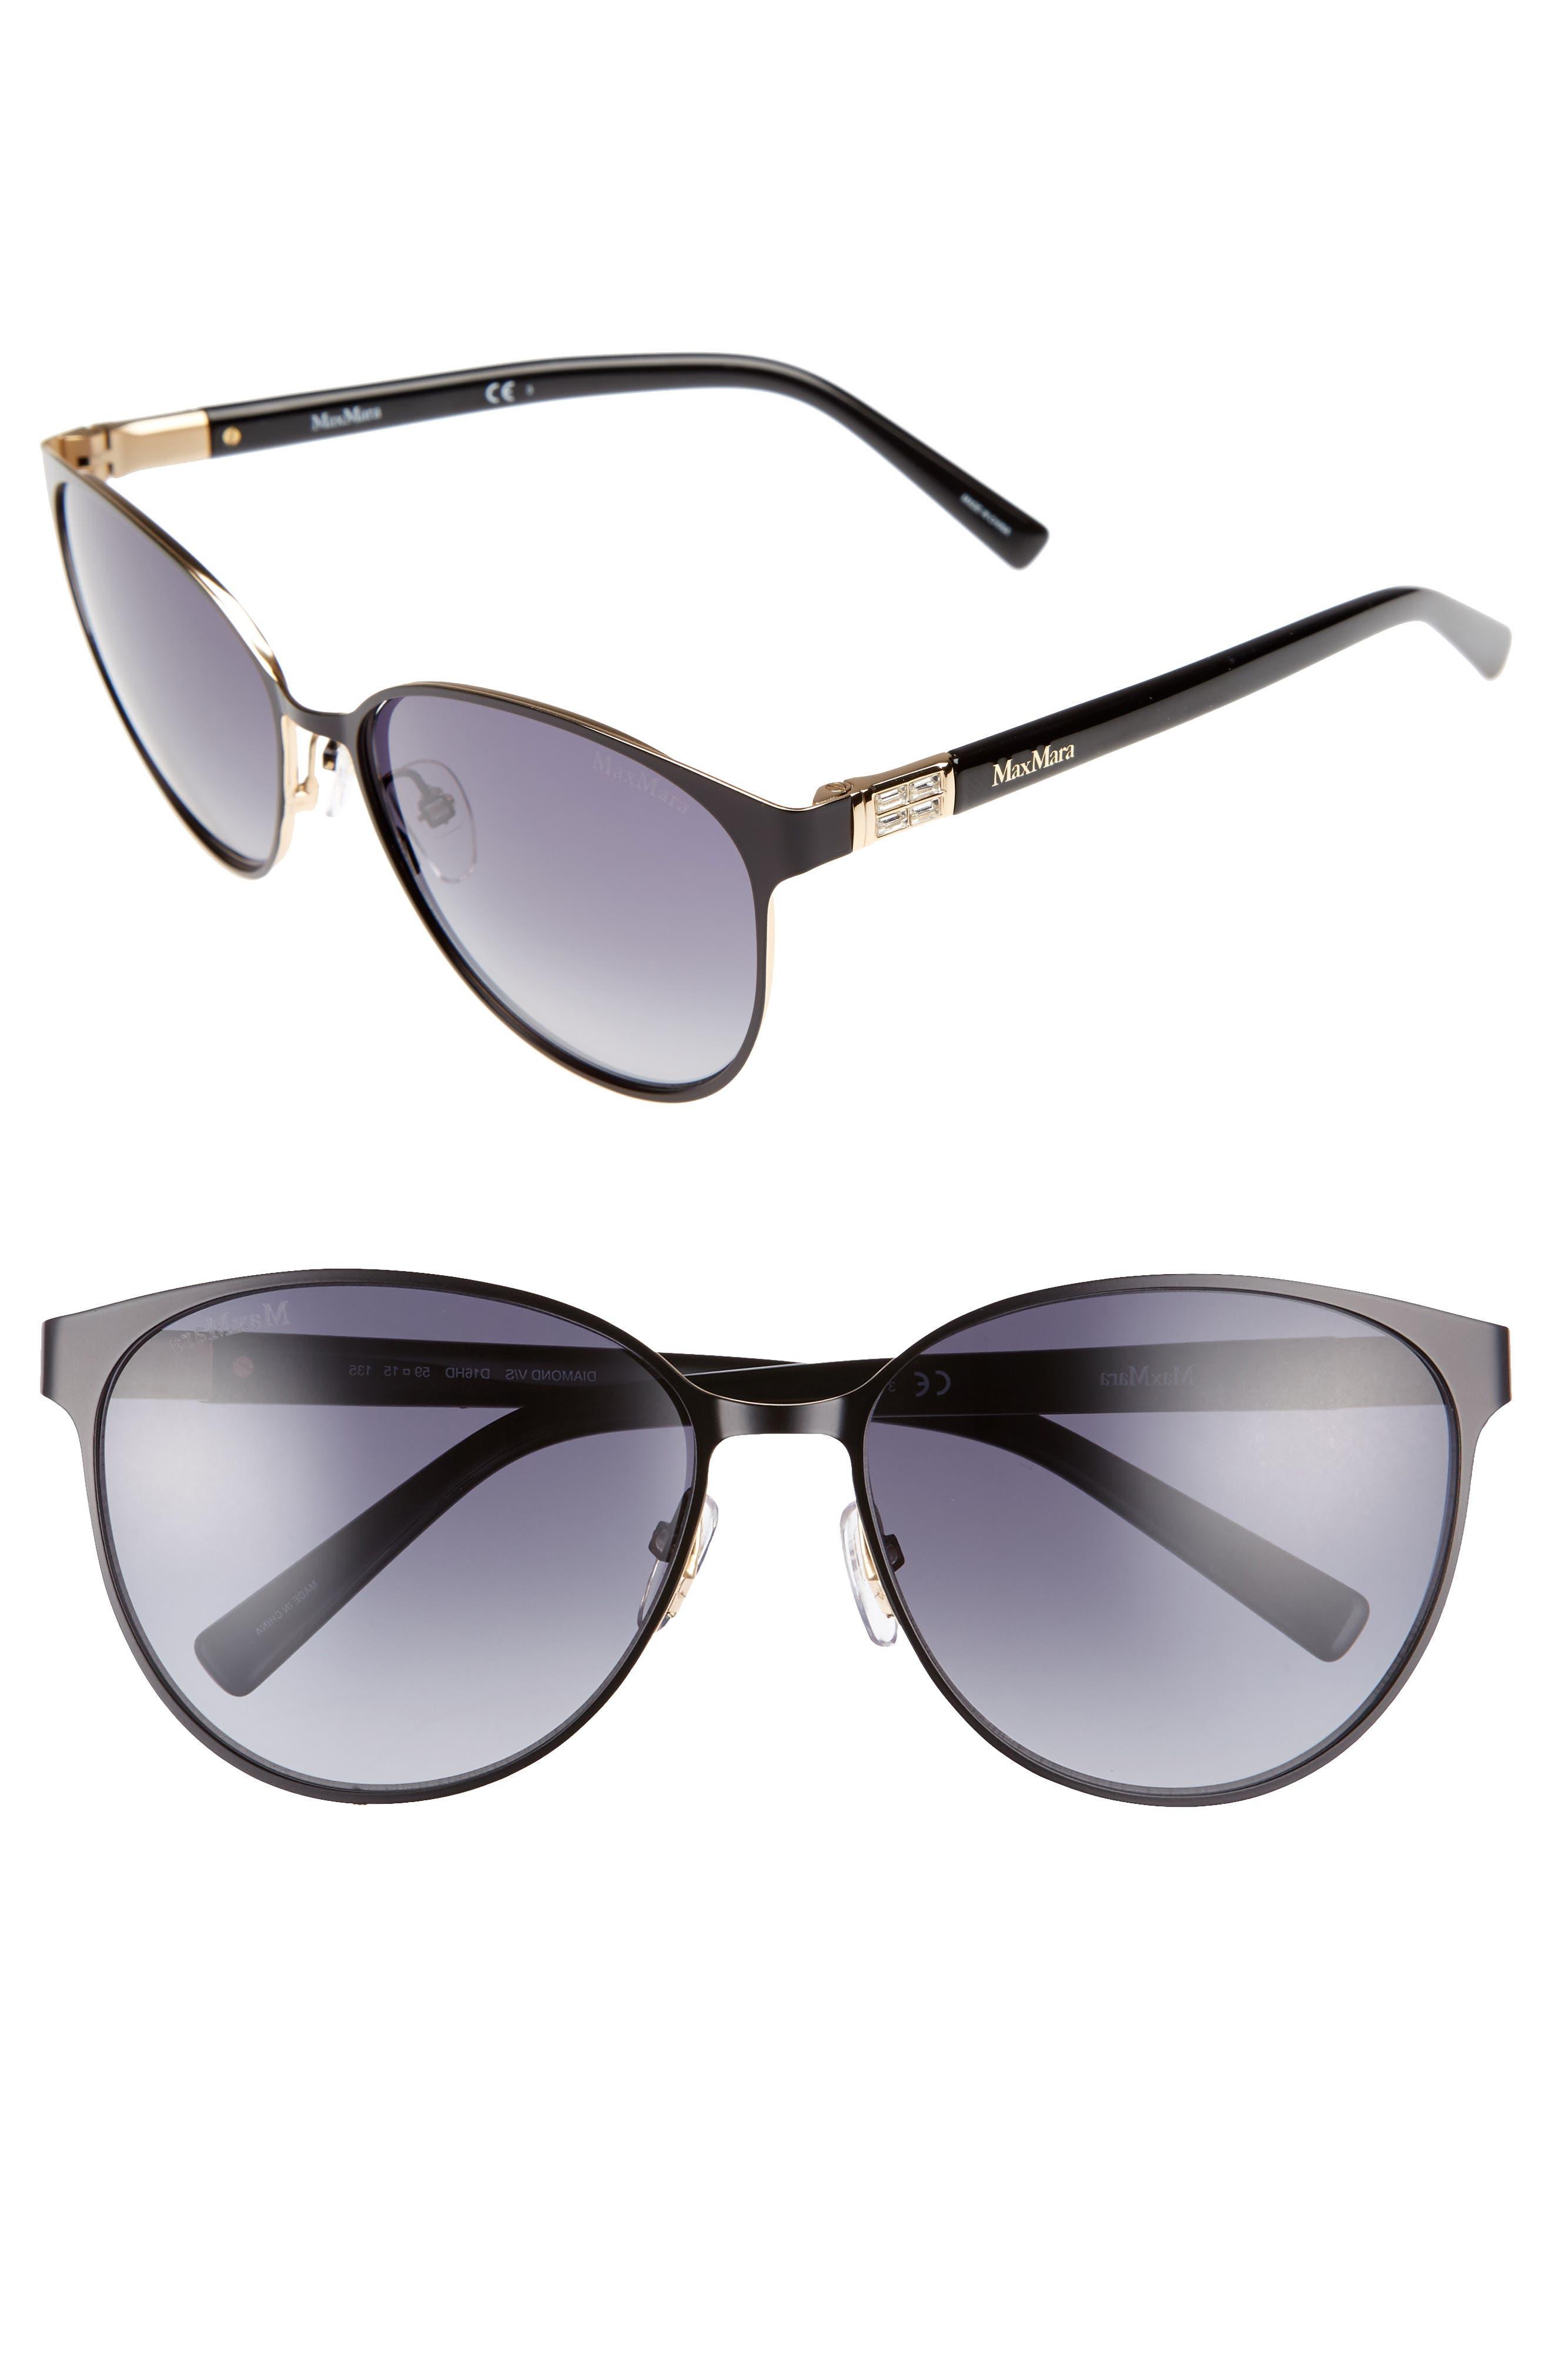 Diamov 59mm Gradient Cat Eye Sunglasses,                         Main,                         color, MATTE BLACK